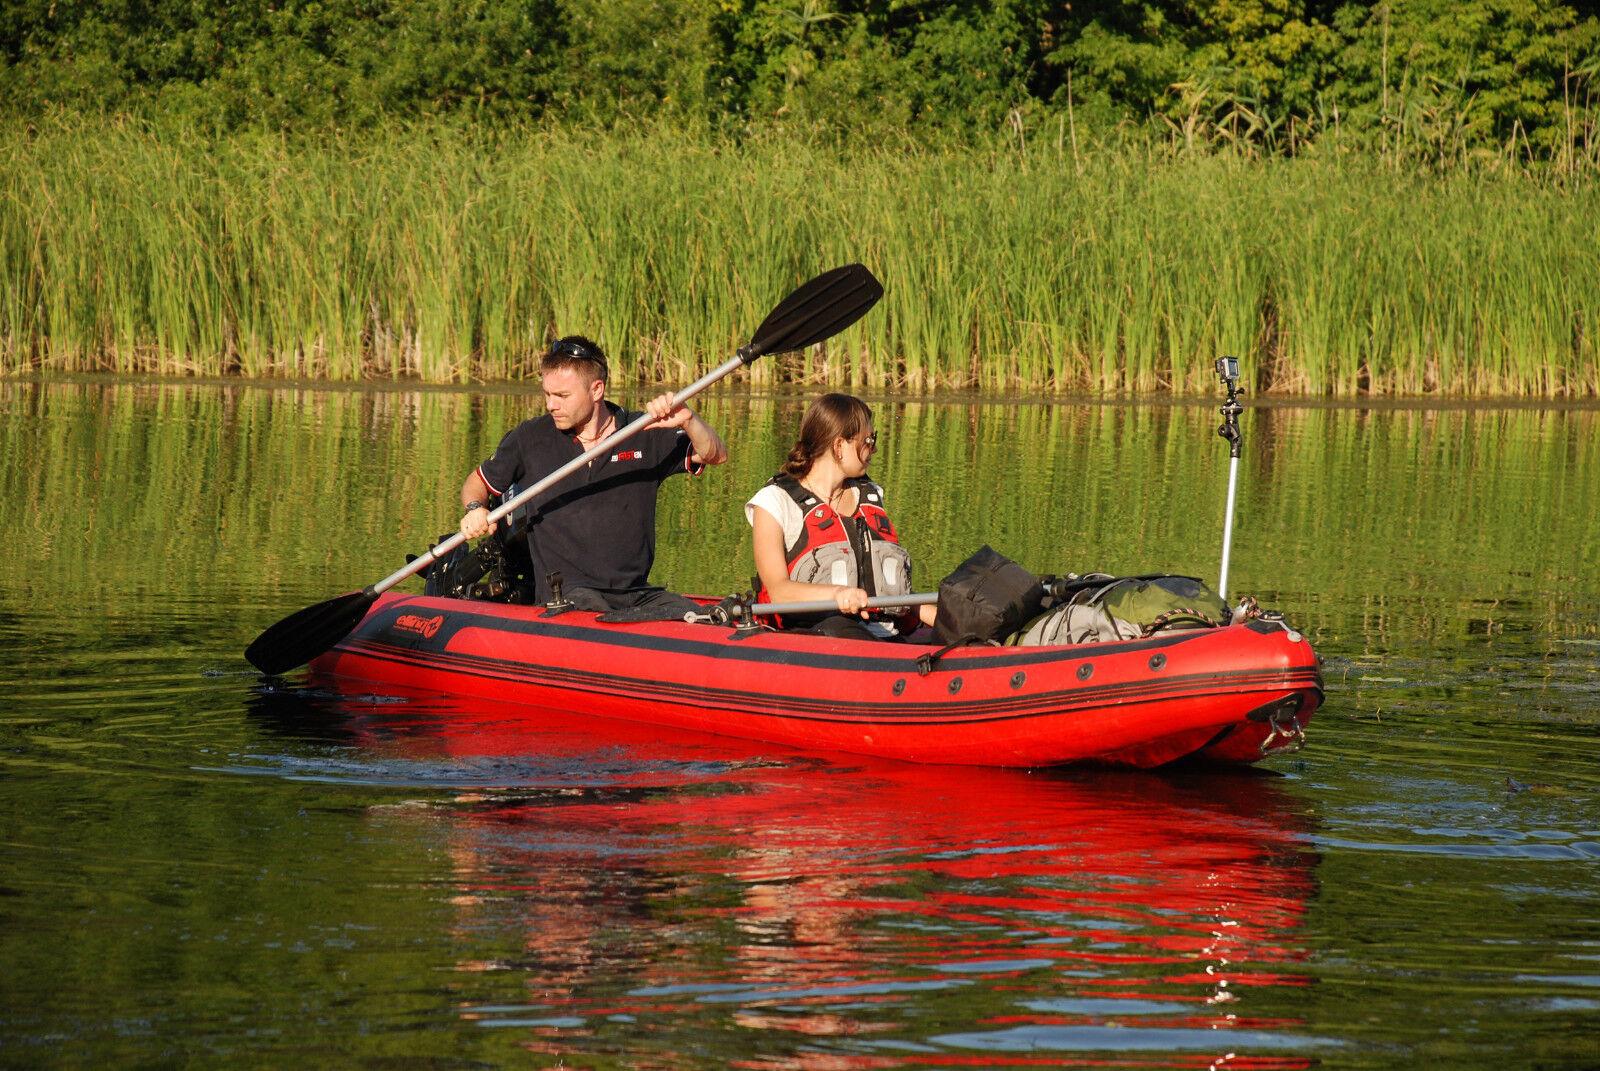 KARDINAL K430 SL Kajak Kaboat Motorkajak Schlauchboot Hunter Explorer Kayak